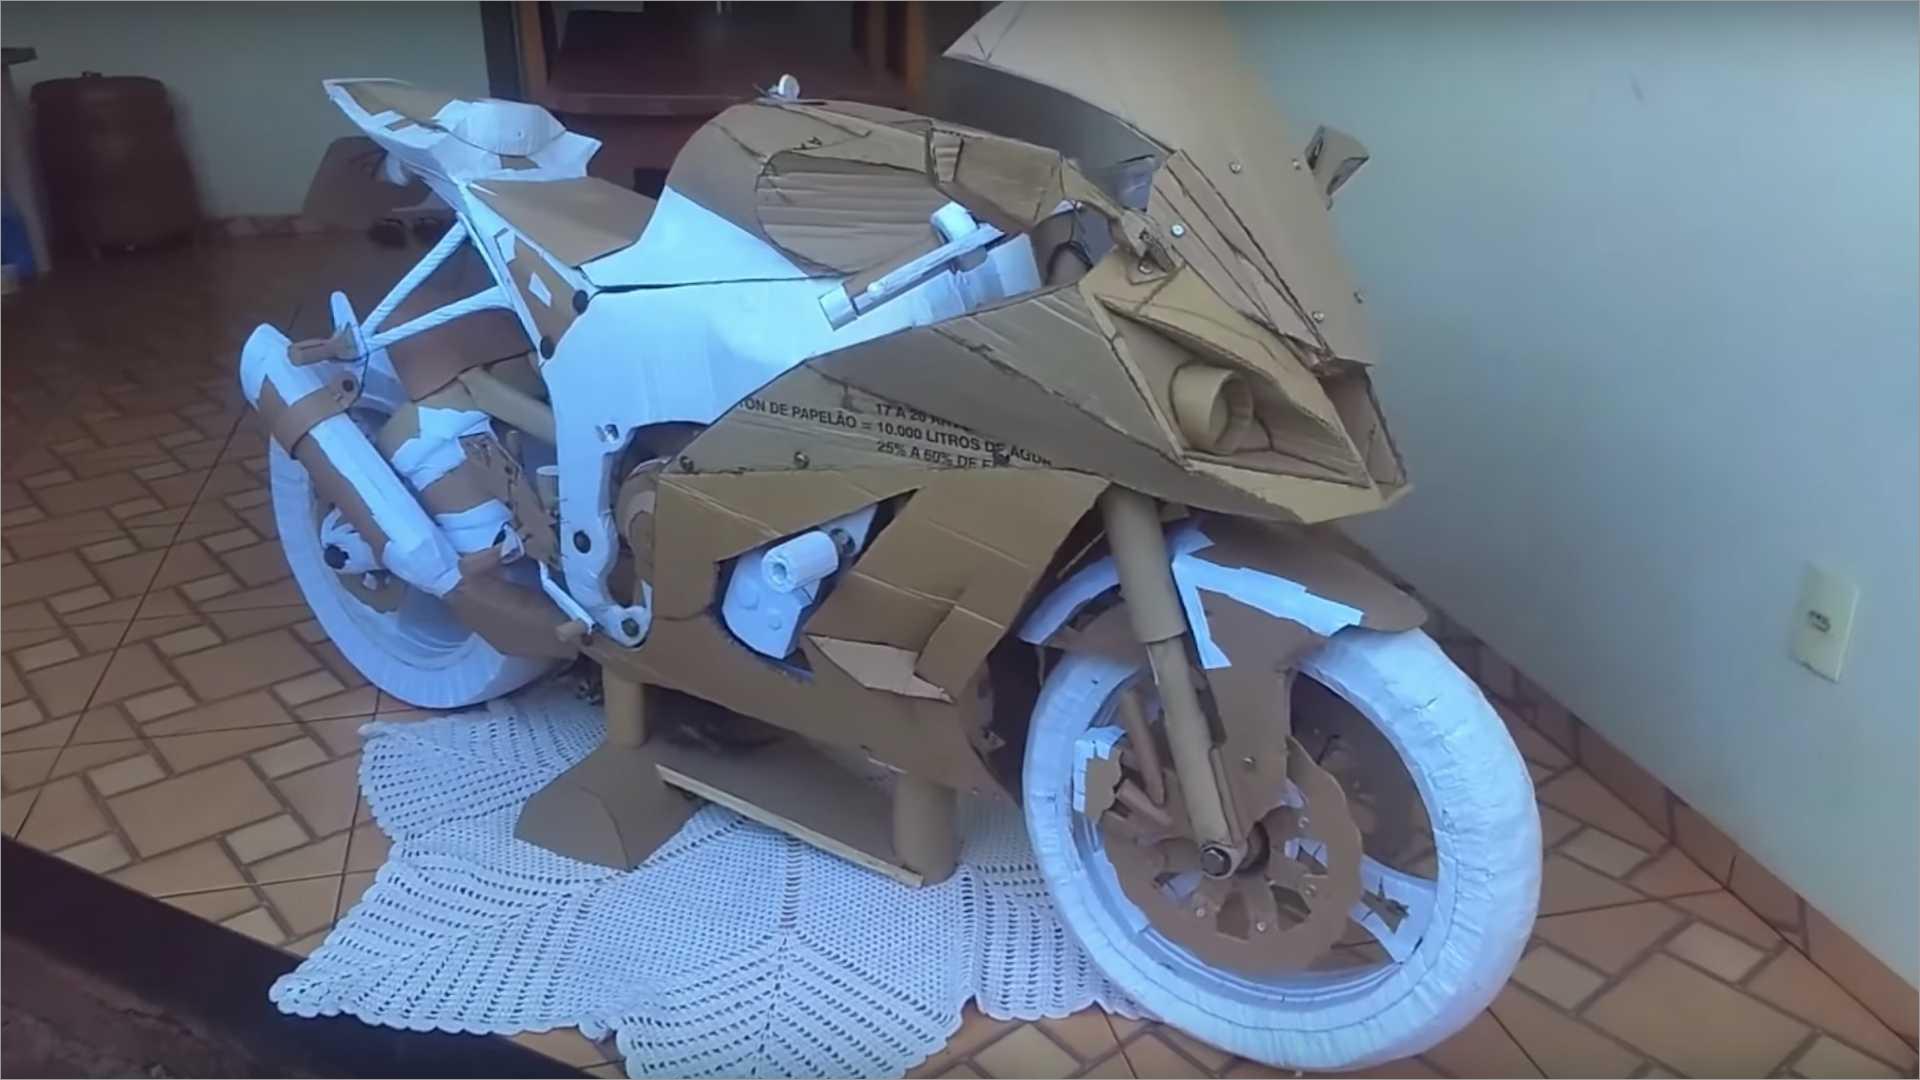 Motorcycle Papercraft Zx 10r Cardboard Papercraft